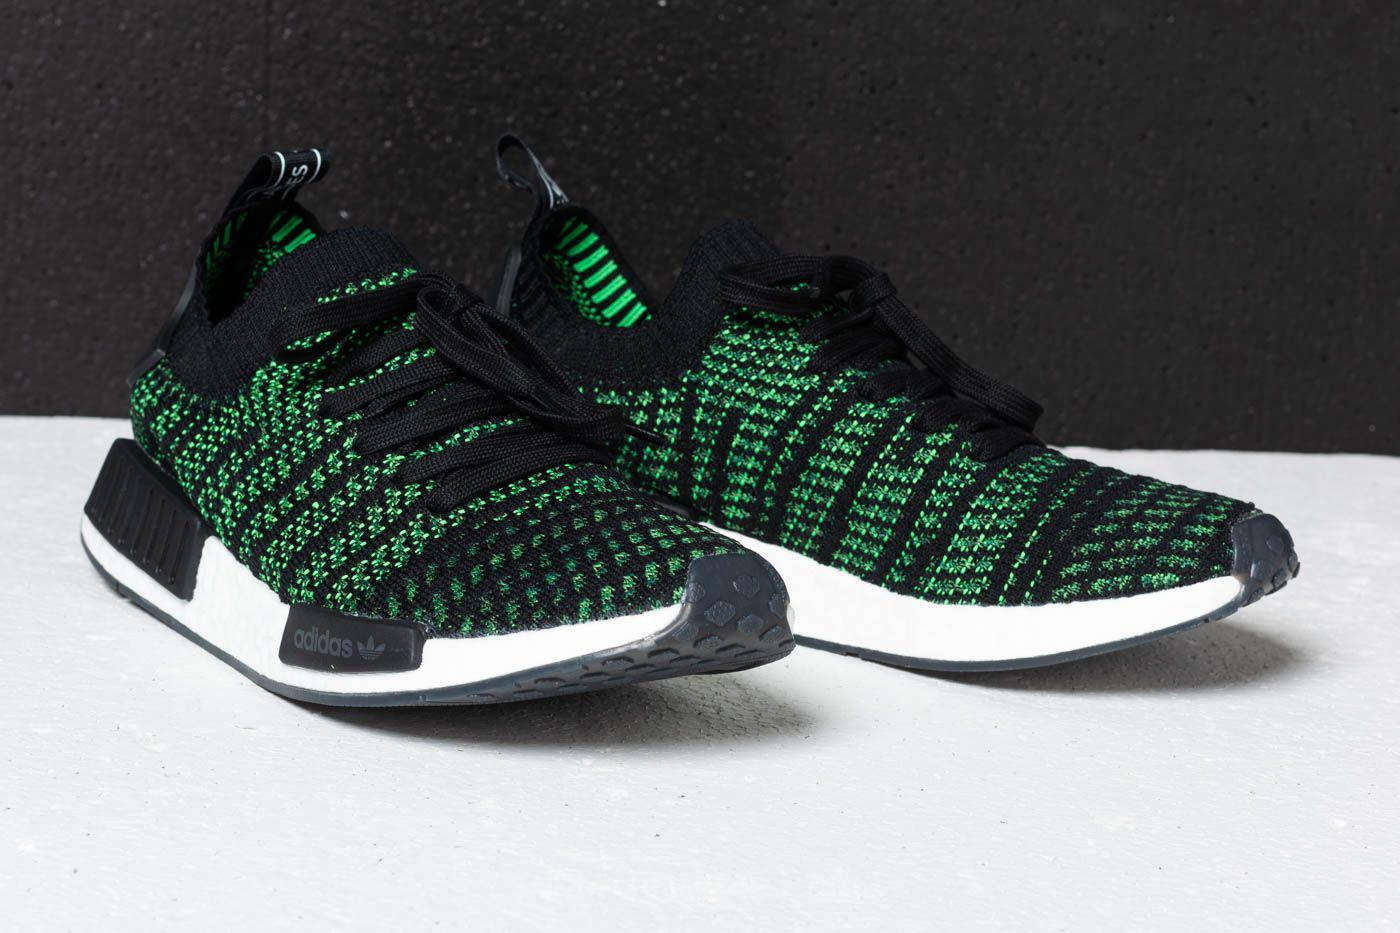 nmd stlt green Shop Clothing \u0026 Shoes Online